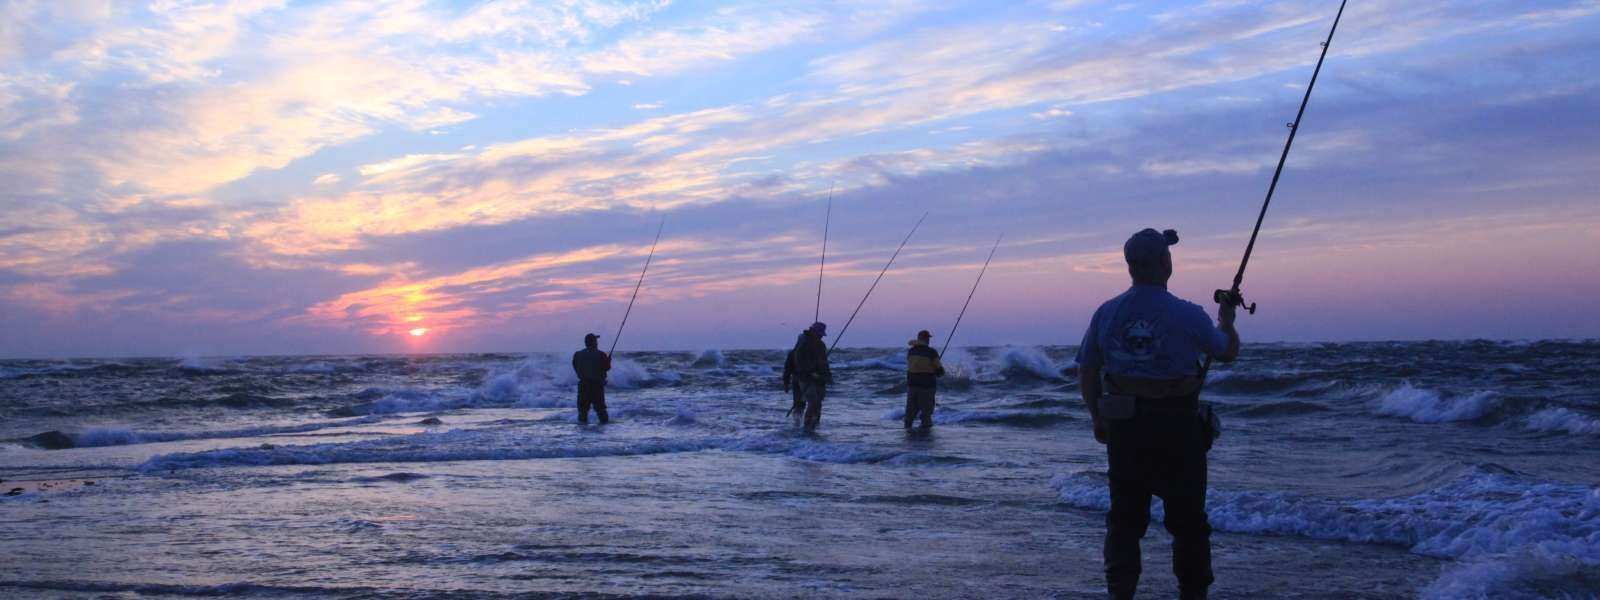 Outer Banks Fishing License Information Web design